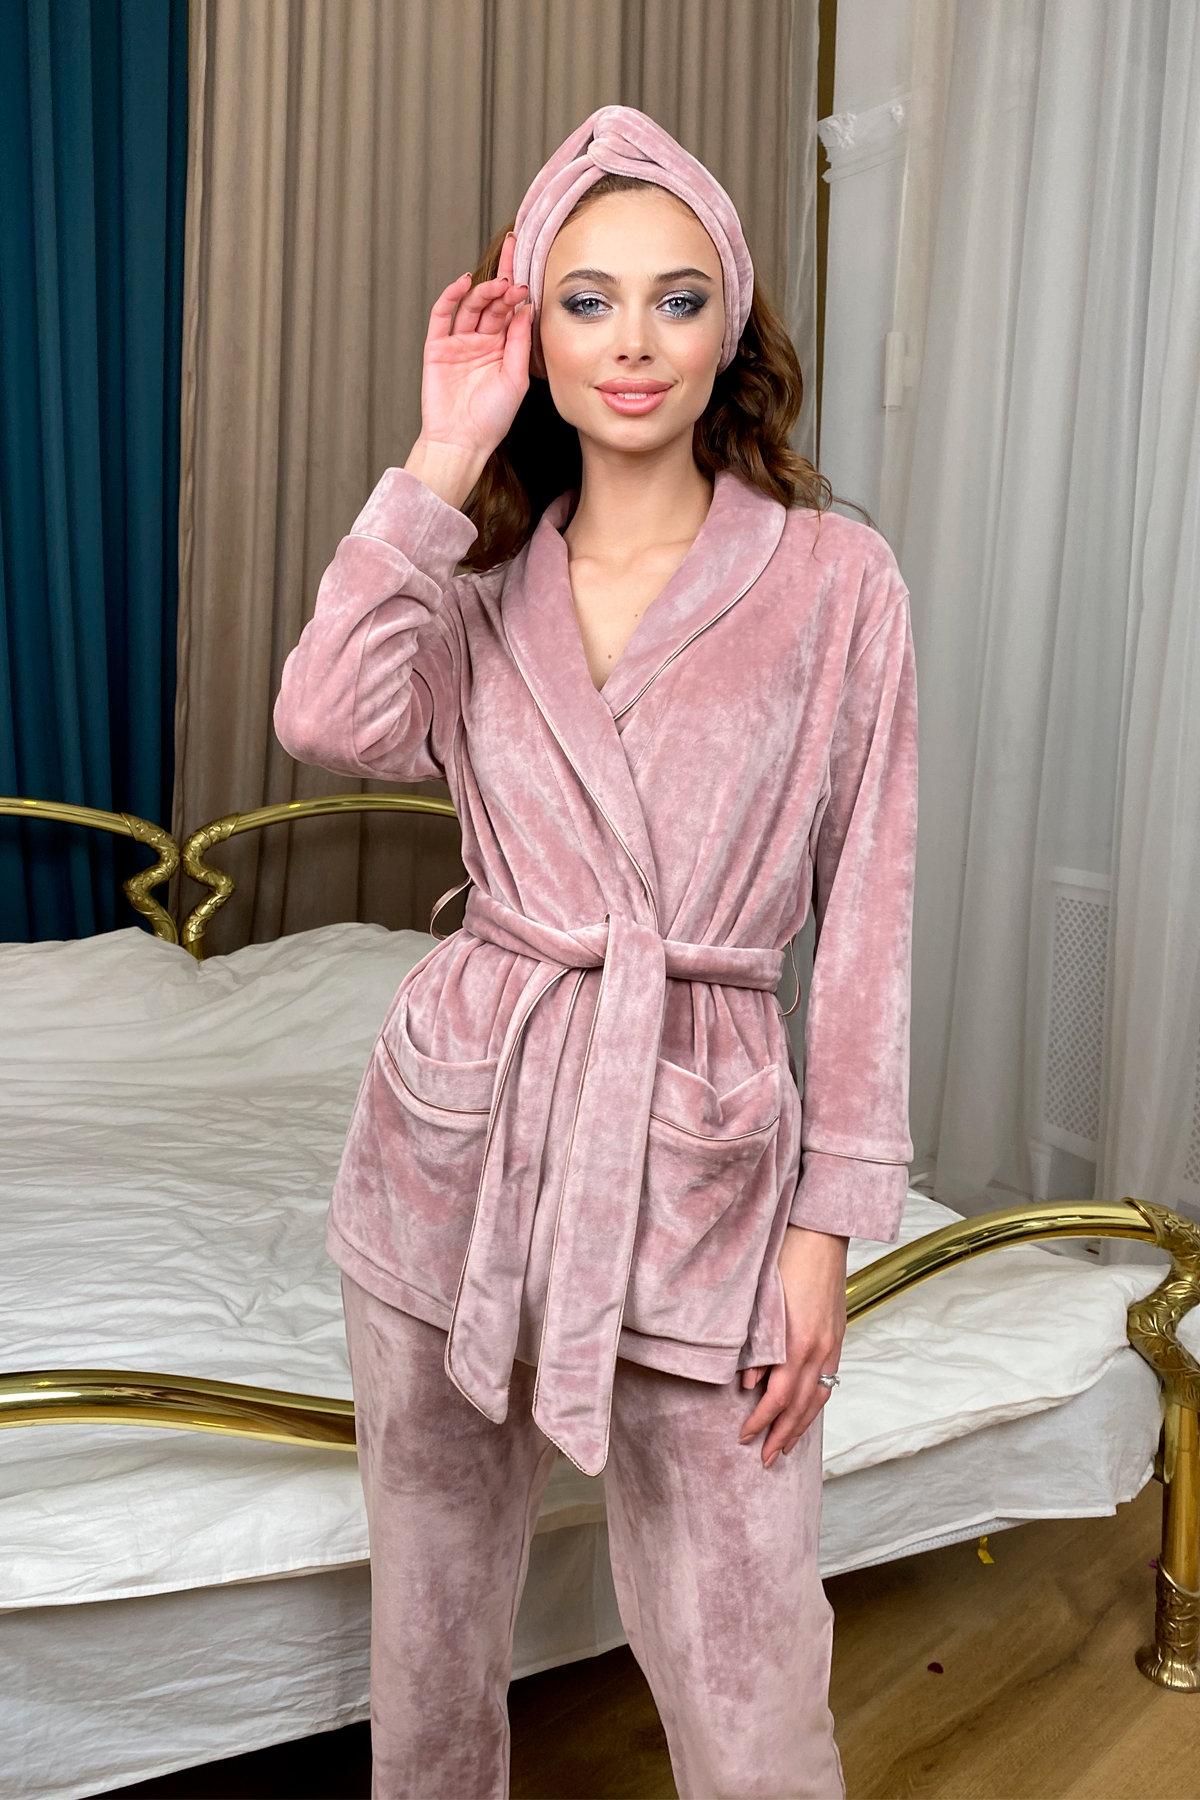 Ясмин пижама из велюра жакет,брюки и маска для сна  10376 АРТ. 46684 Цвет: Пудра - фото 7, интернет магазин tm-modus.ru